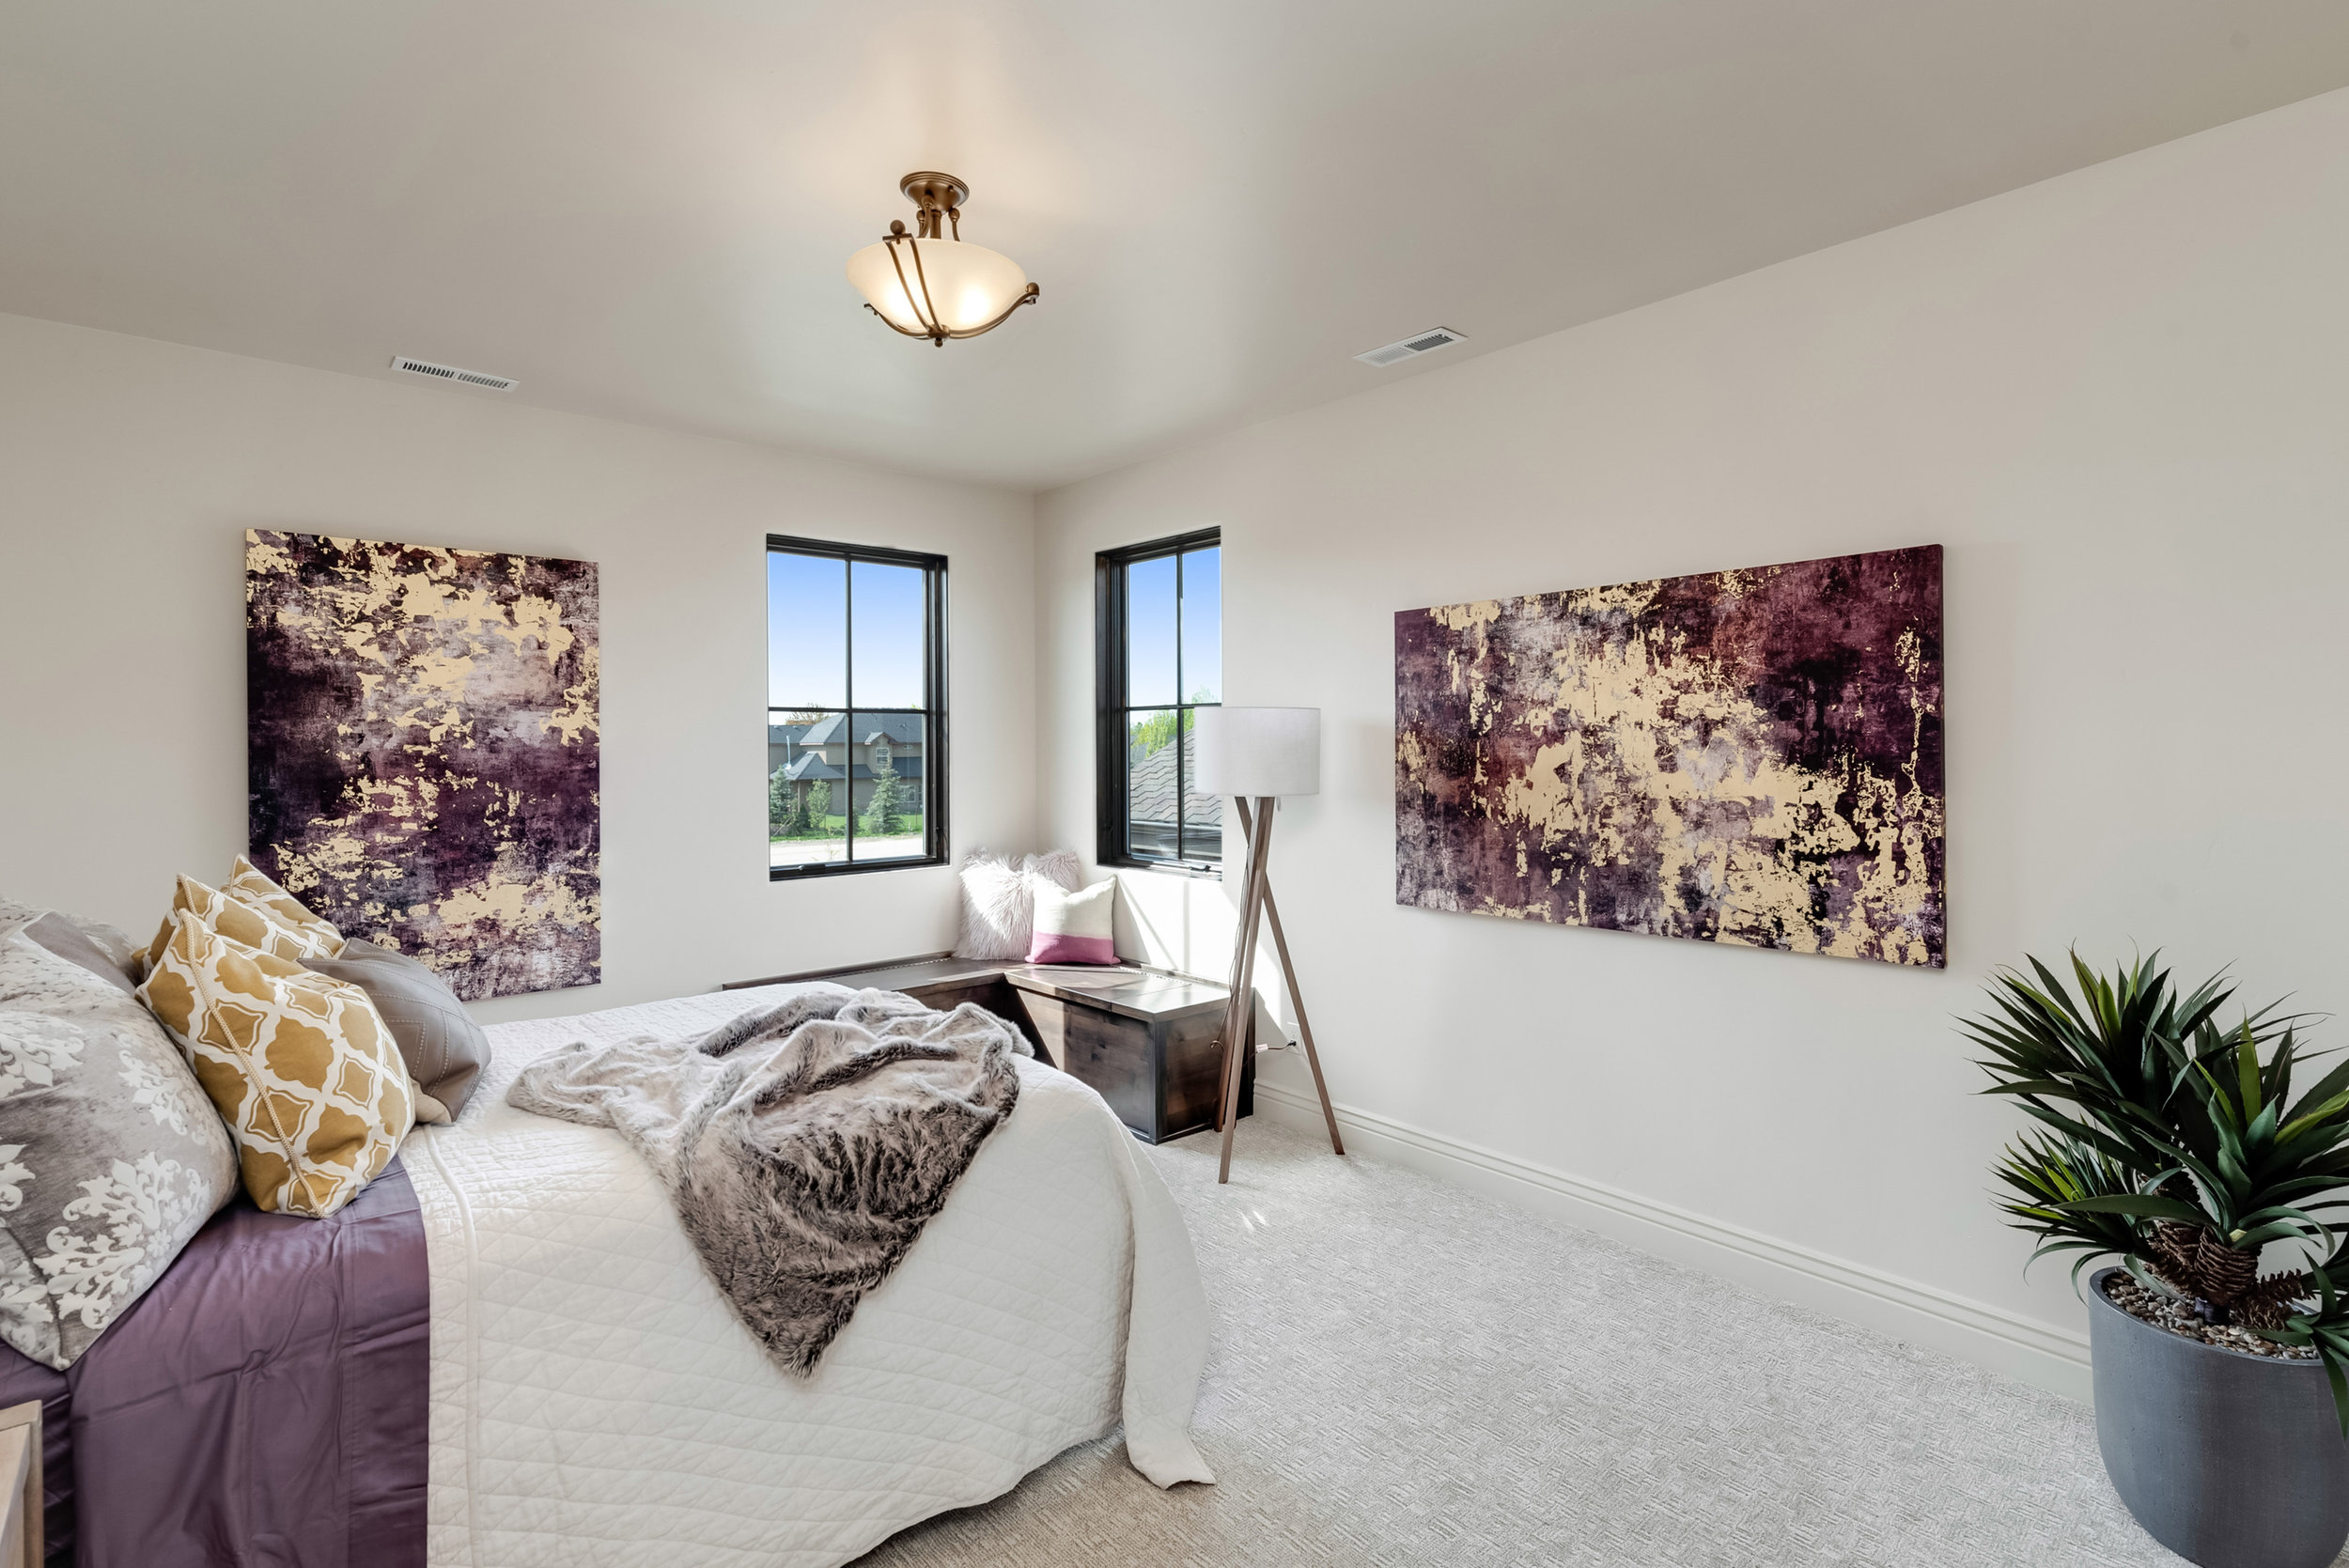 57-Bedroom.jpg